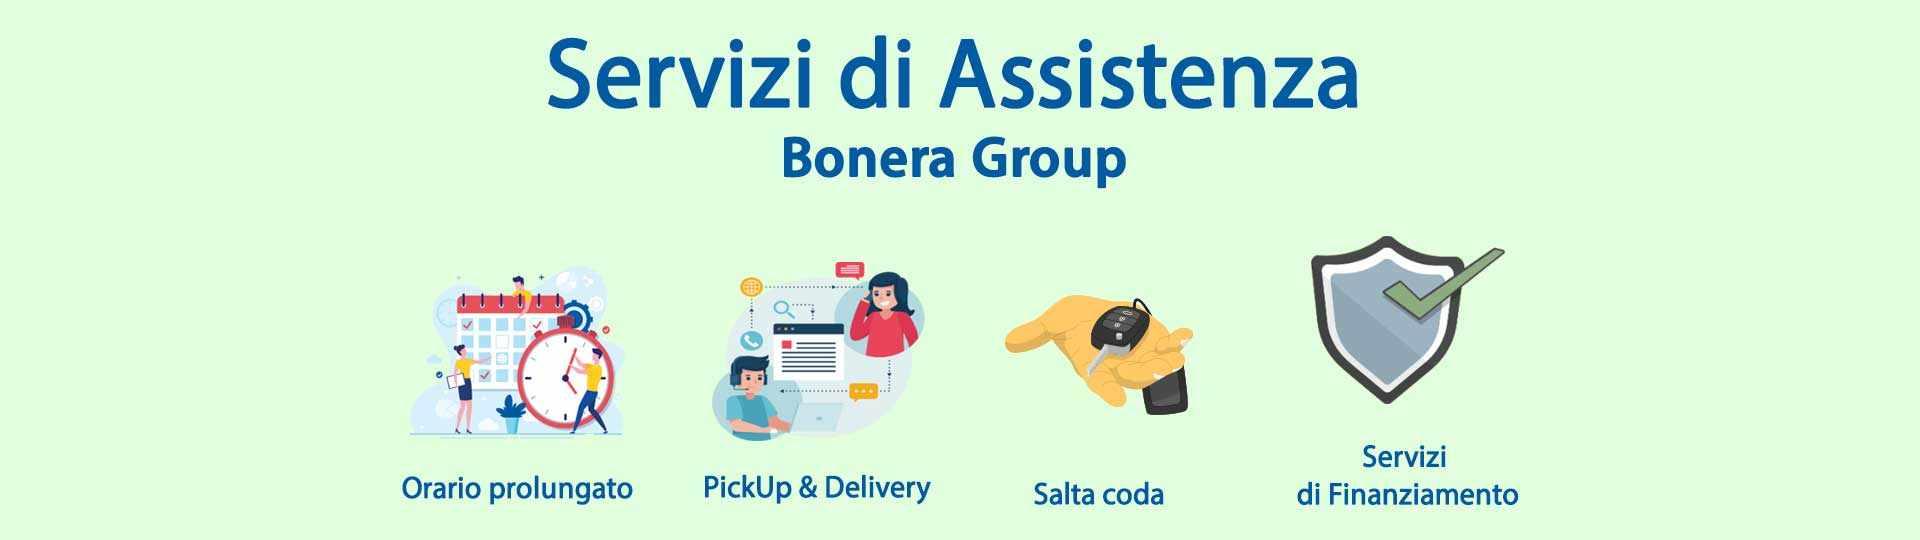 header_servizi_assistenza.jpg